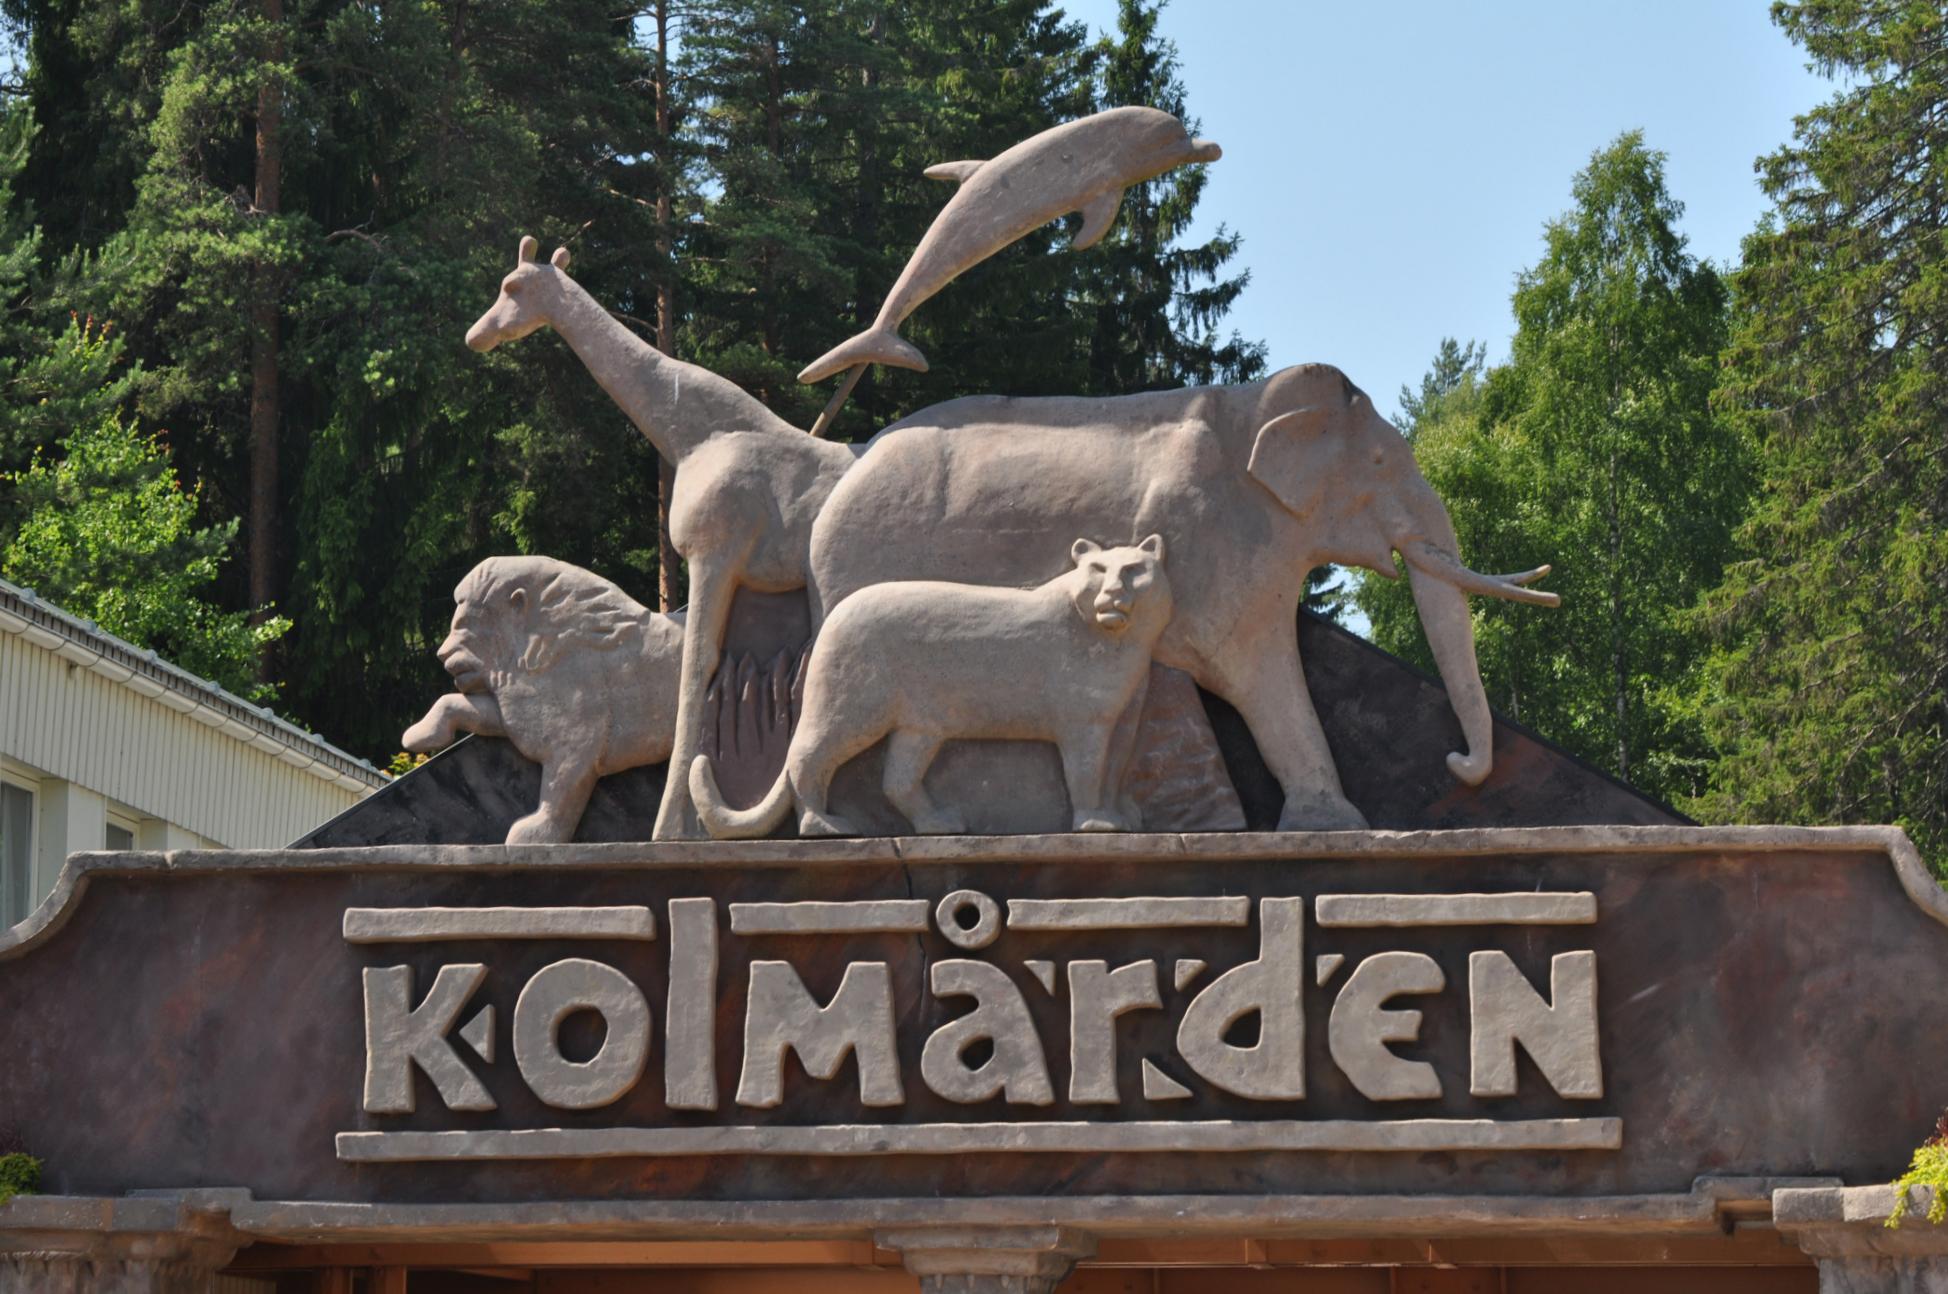 Nyrenoverat Kolmrden. Newly renovated Kolmrden. - Airbnb